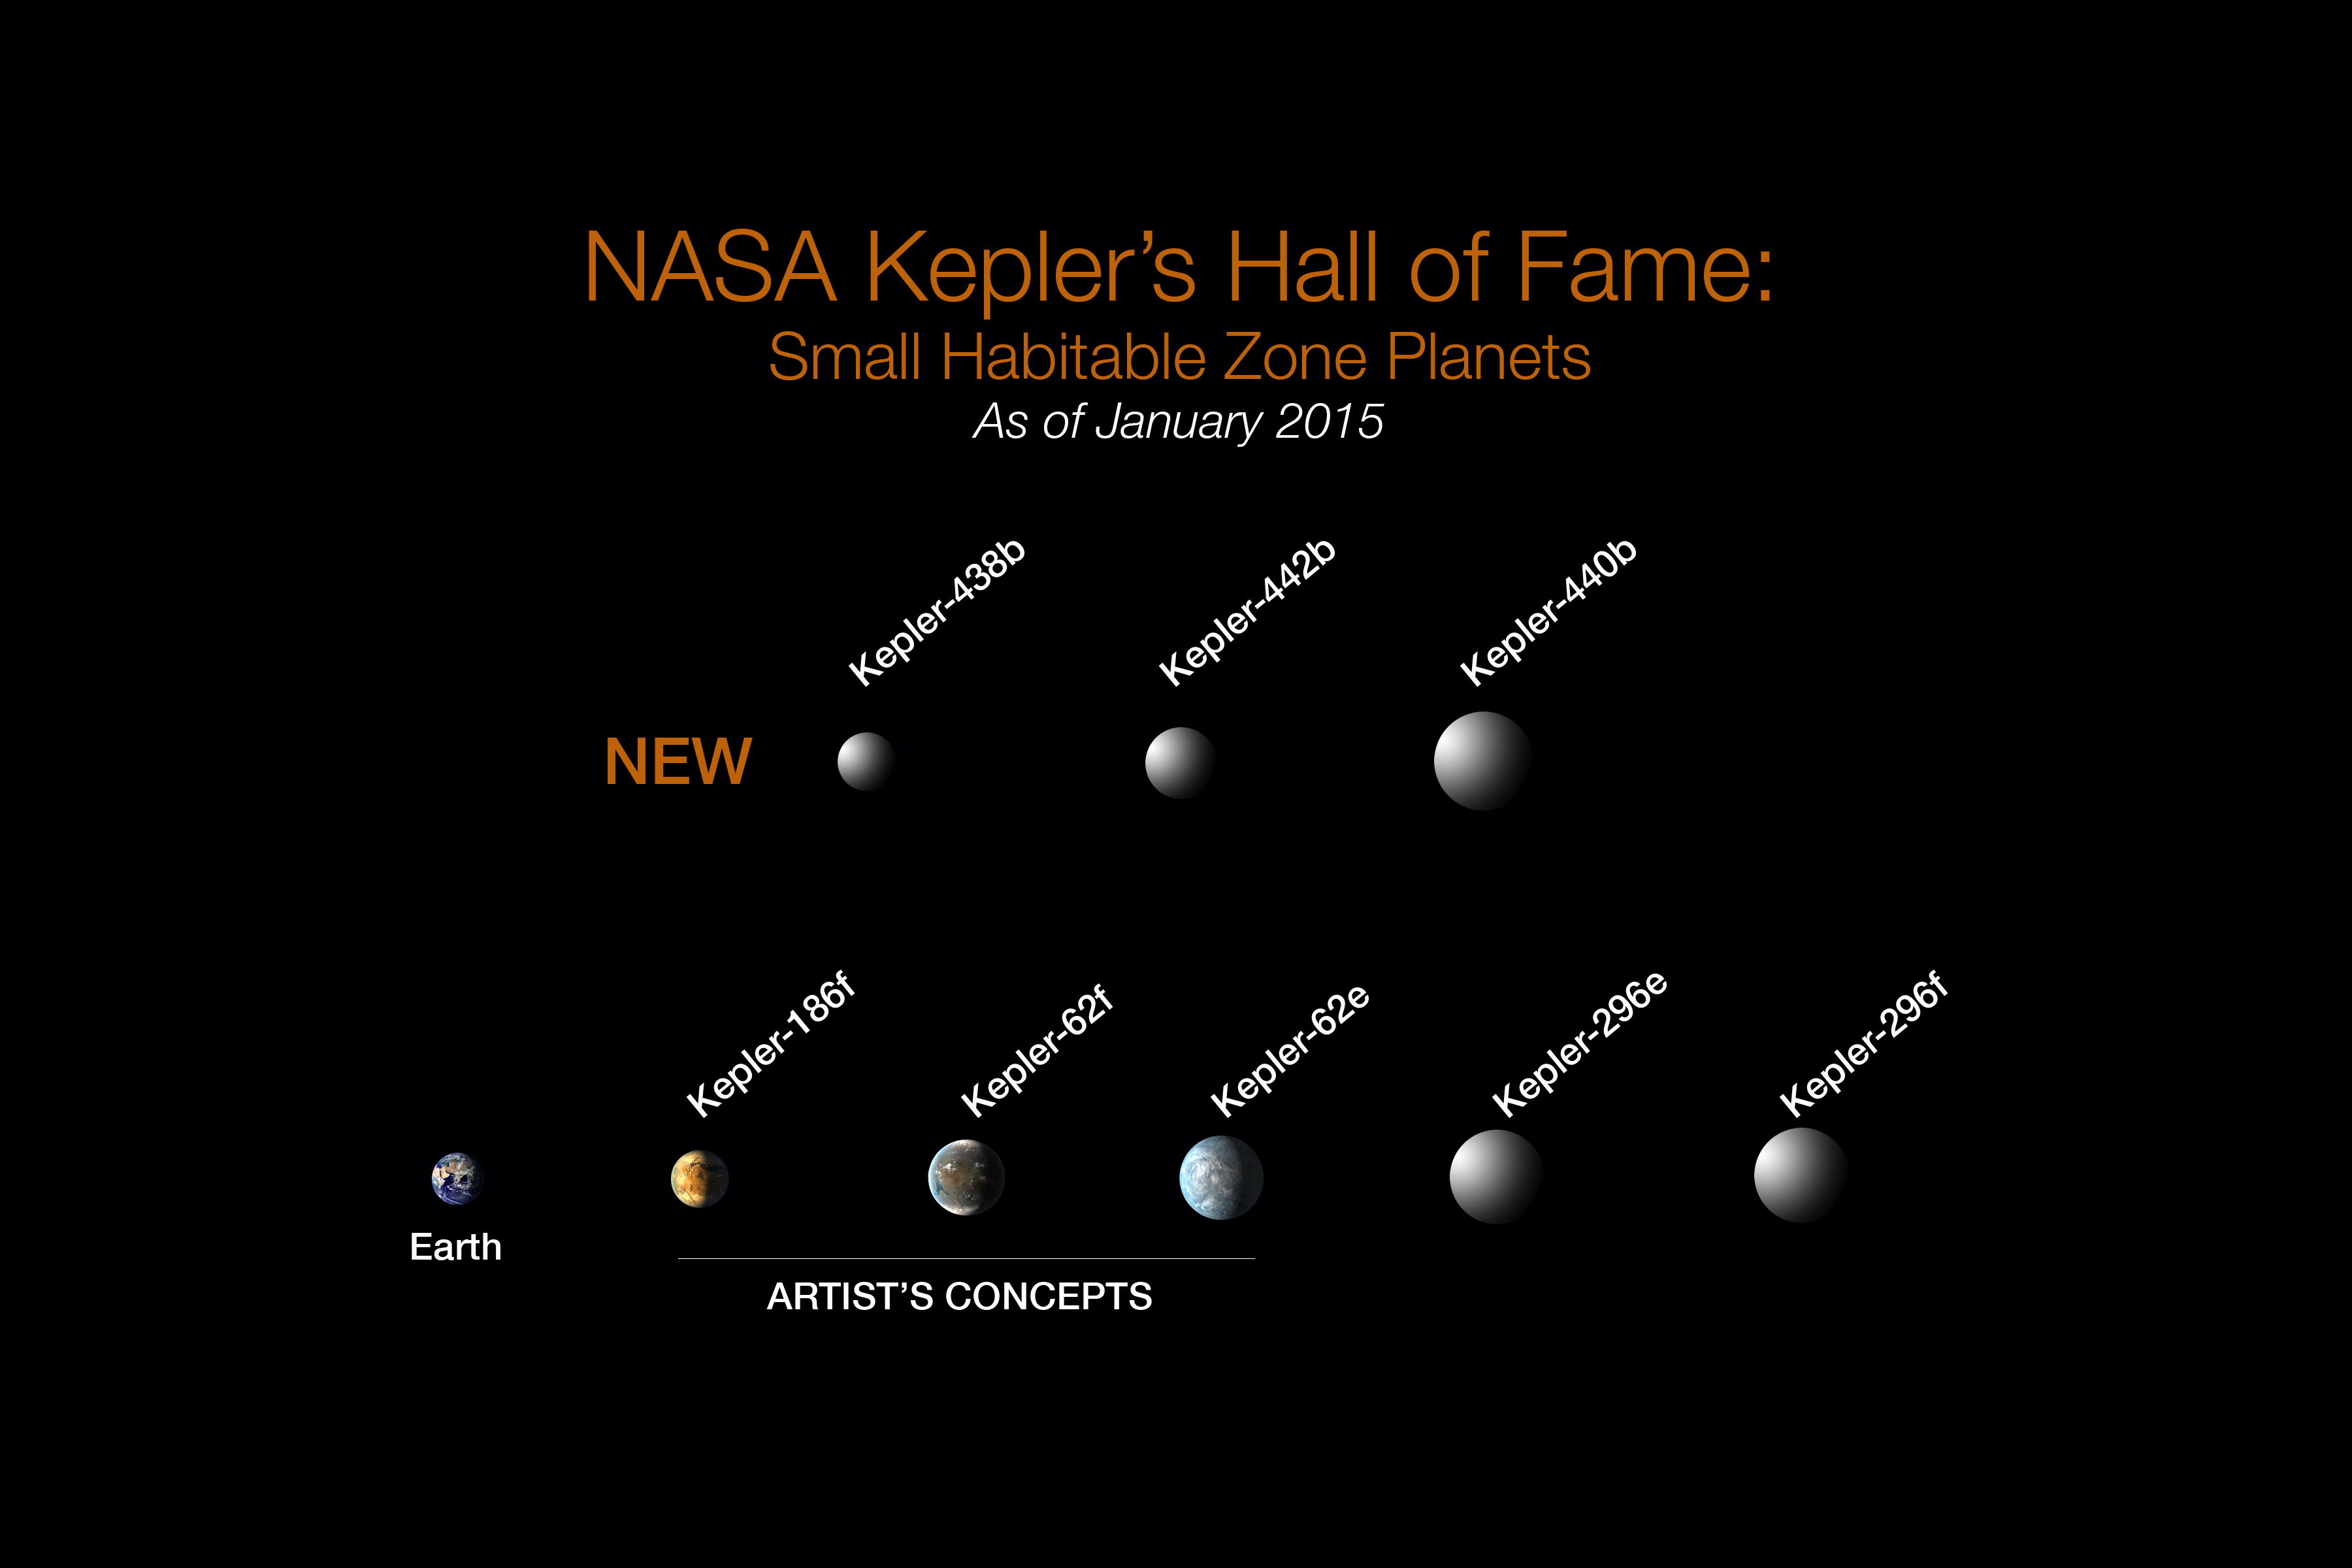 NASA's Kepler telescope identifies most Earth-like planet yet